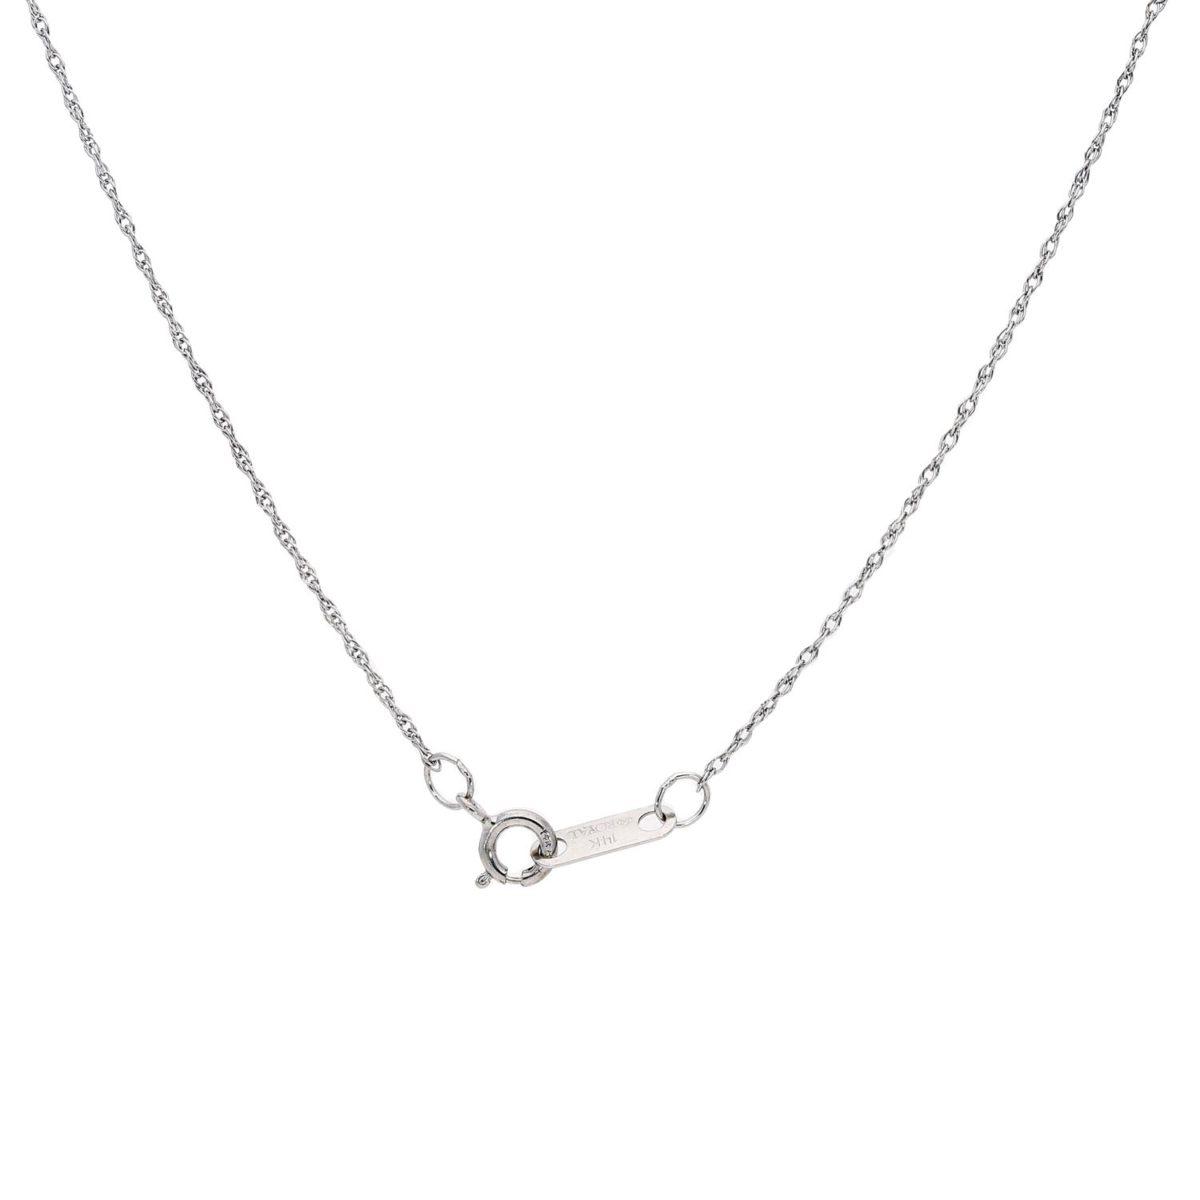 Diamond NecklaceStyle #: ROY-WC4774D